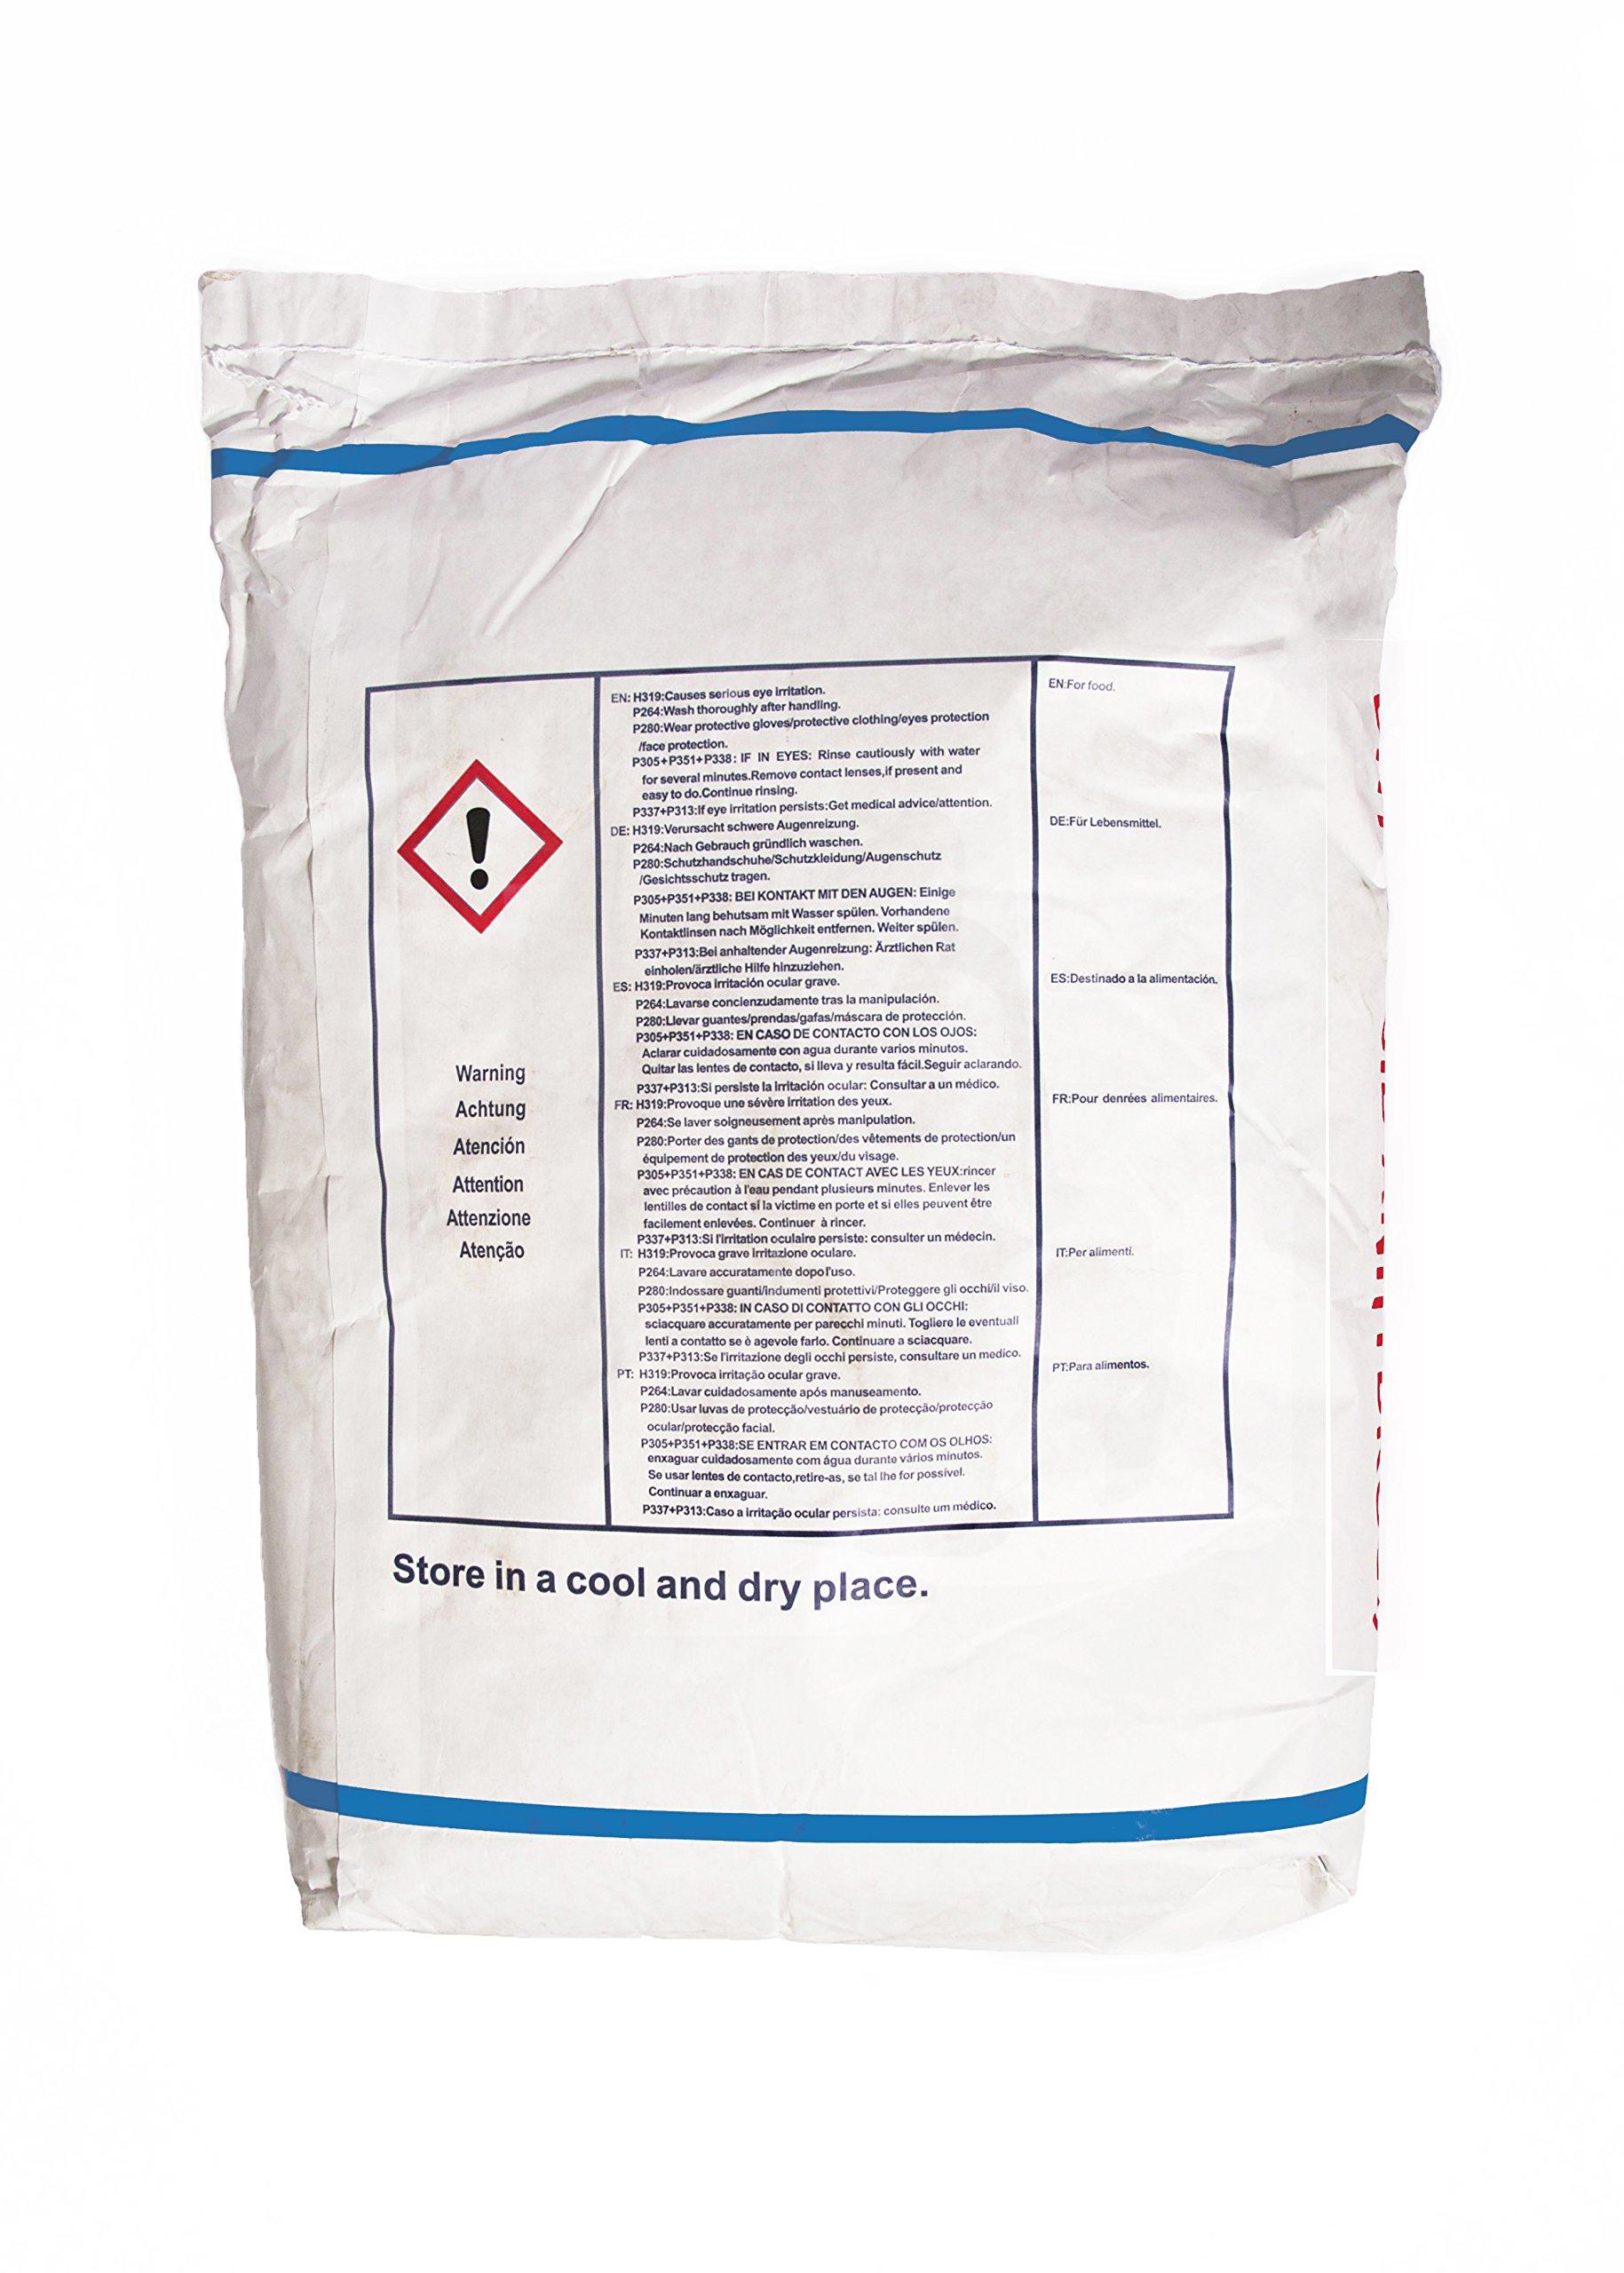 Citric Acid, Granular Anhydrous FCC/USP 99.5% - Pallet of 44 50lb Bags